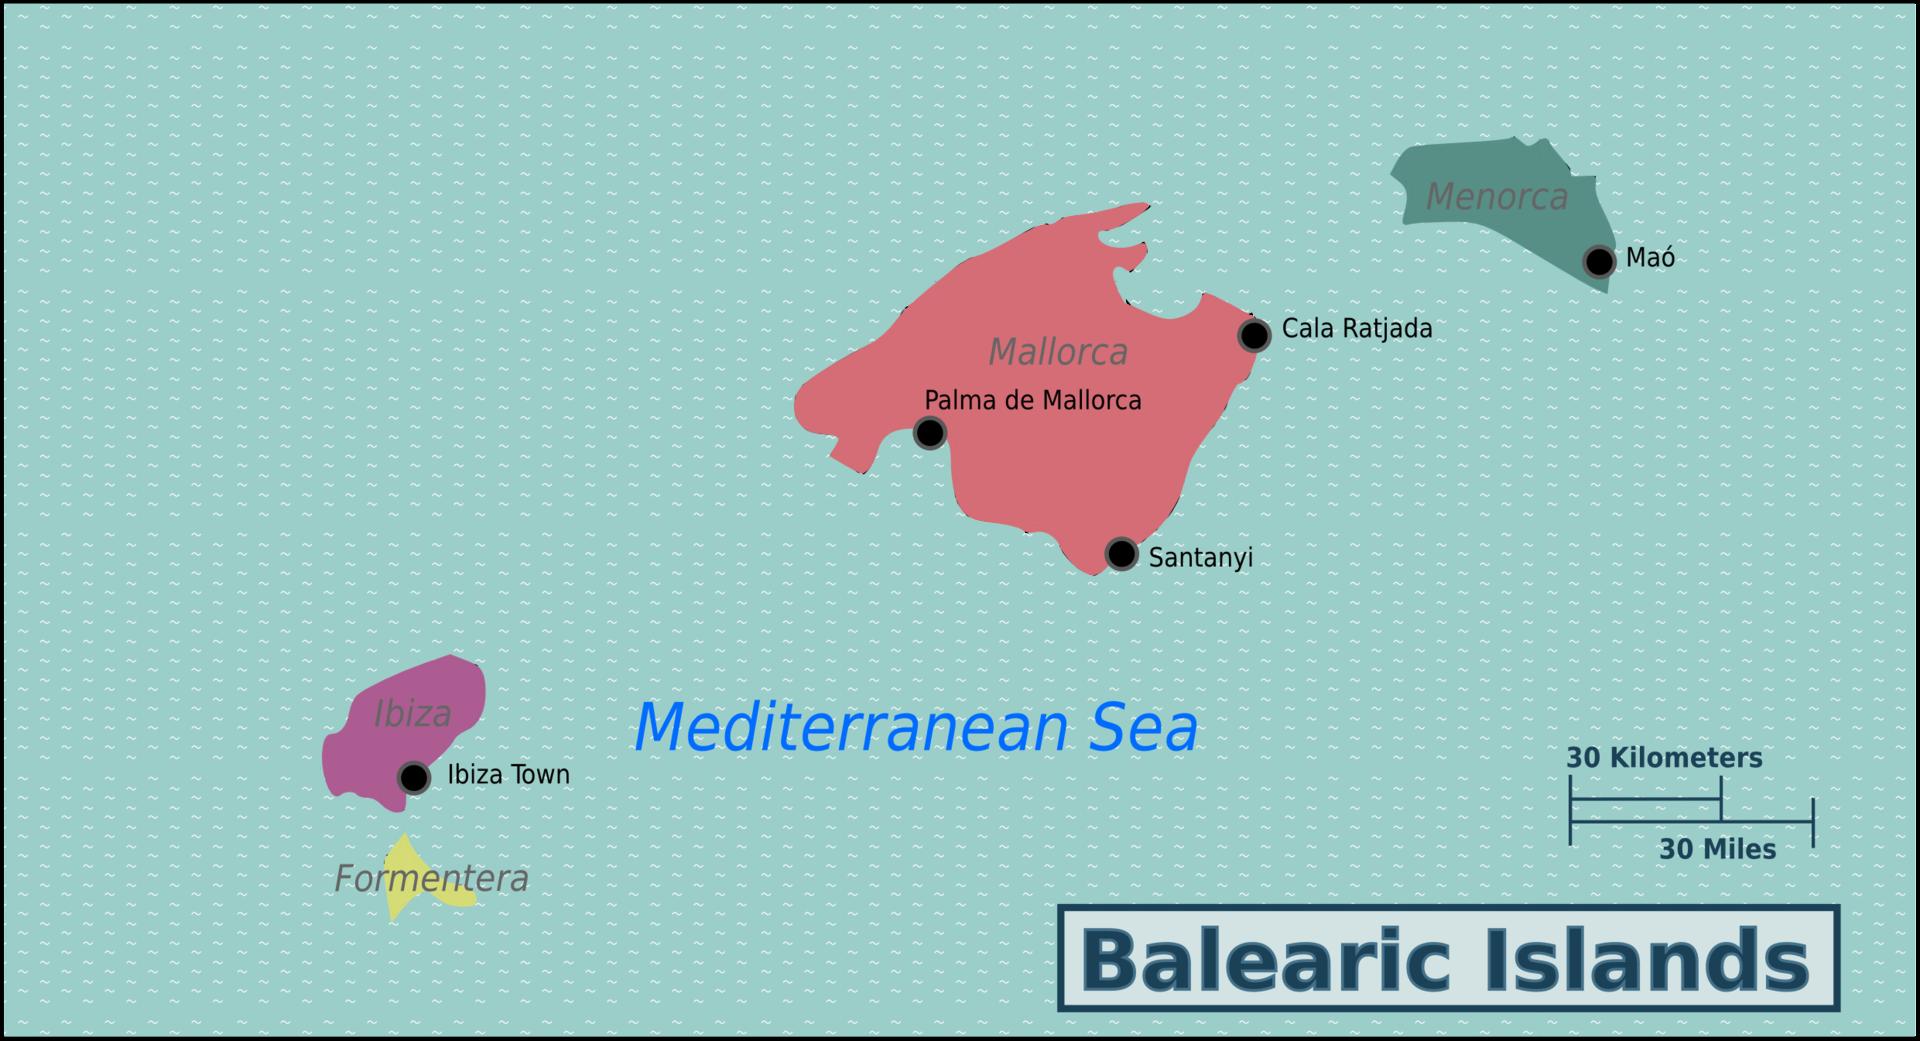 Balearicc Islands Map